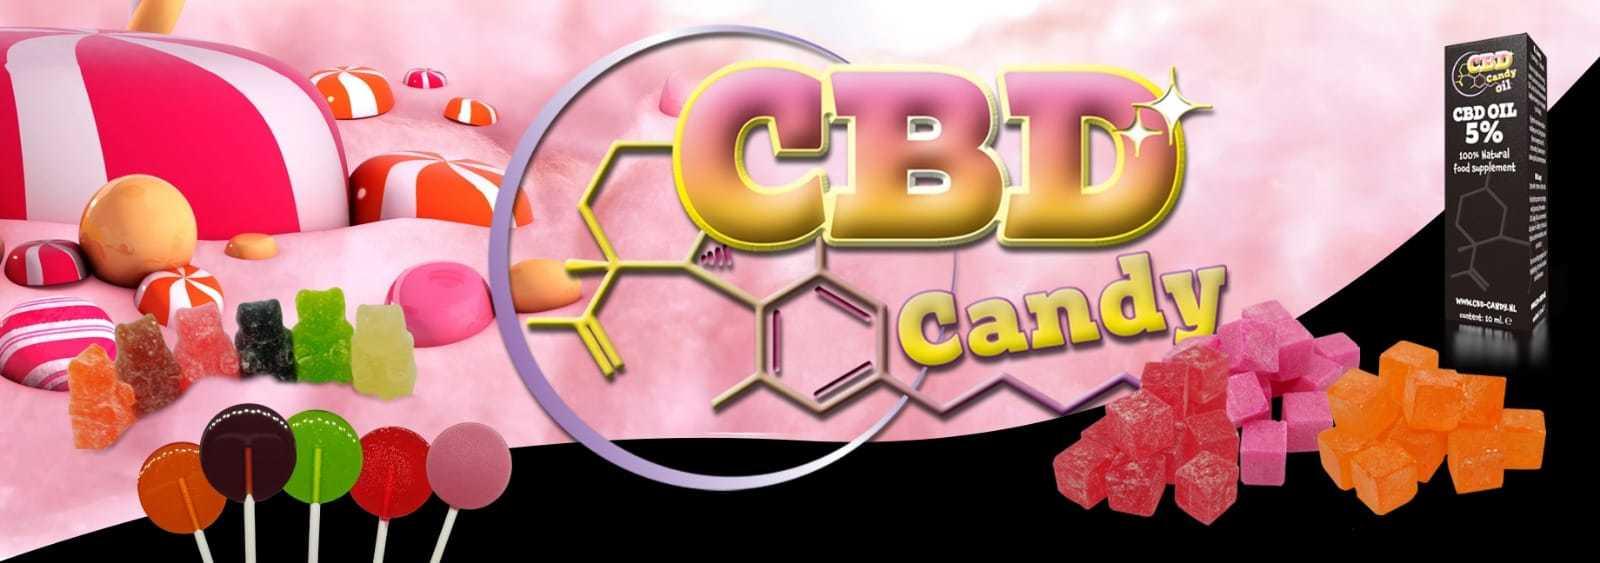 CBD-Candy Banner